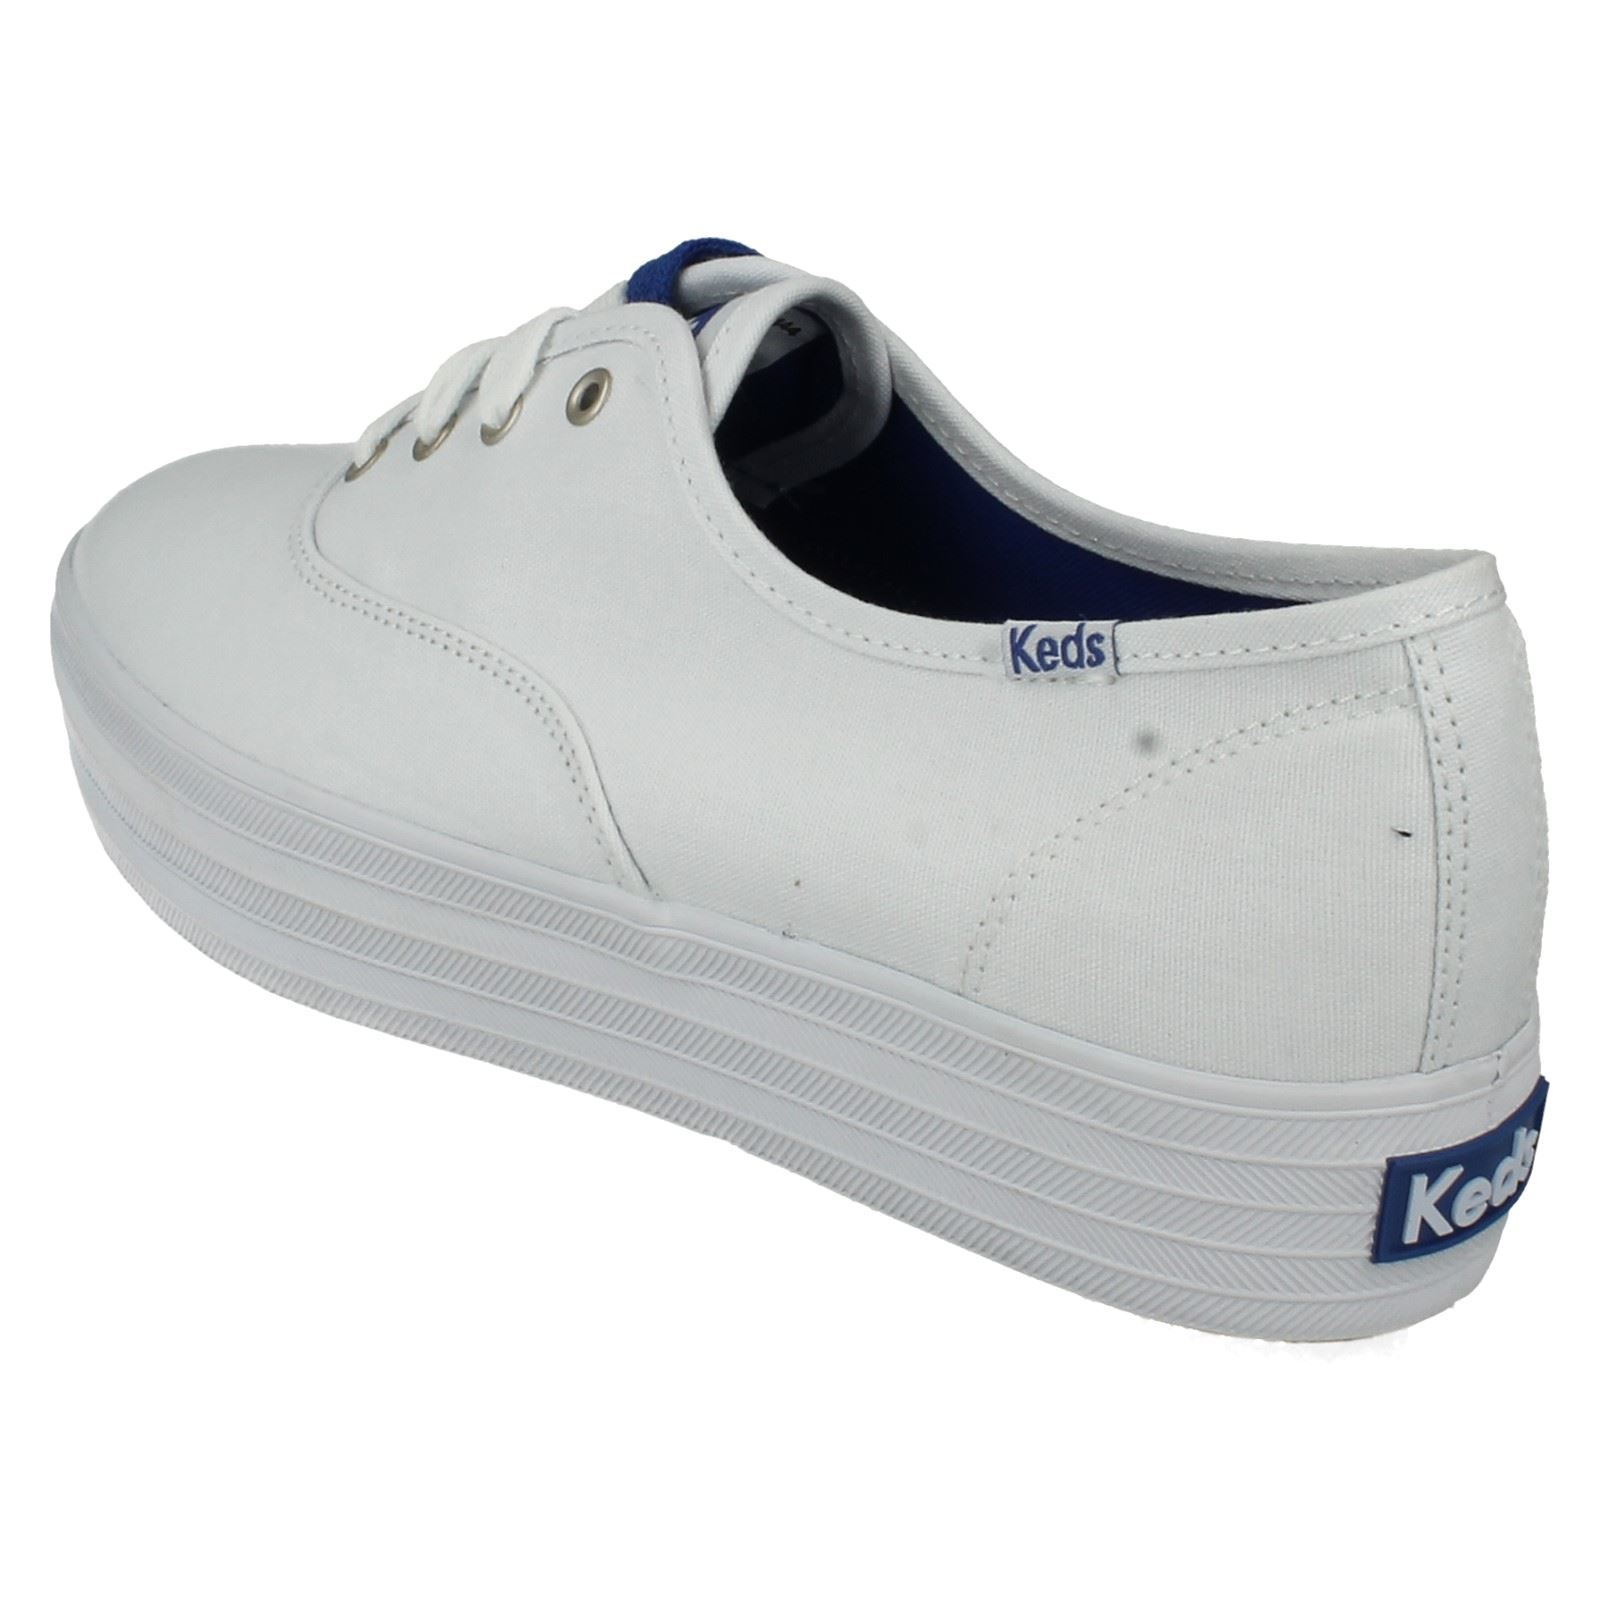 keds canvas shoes white ebay